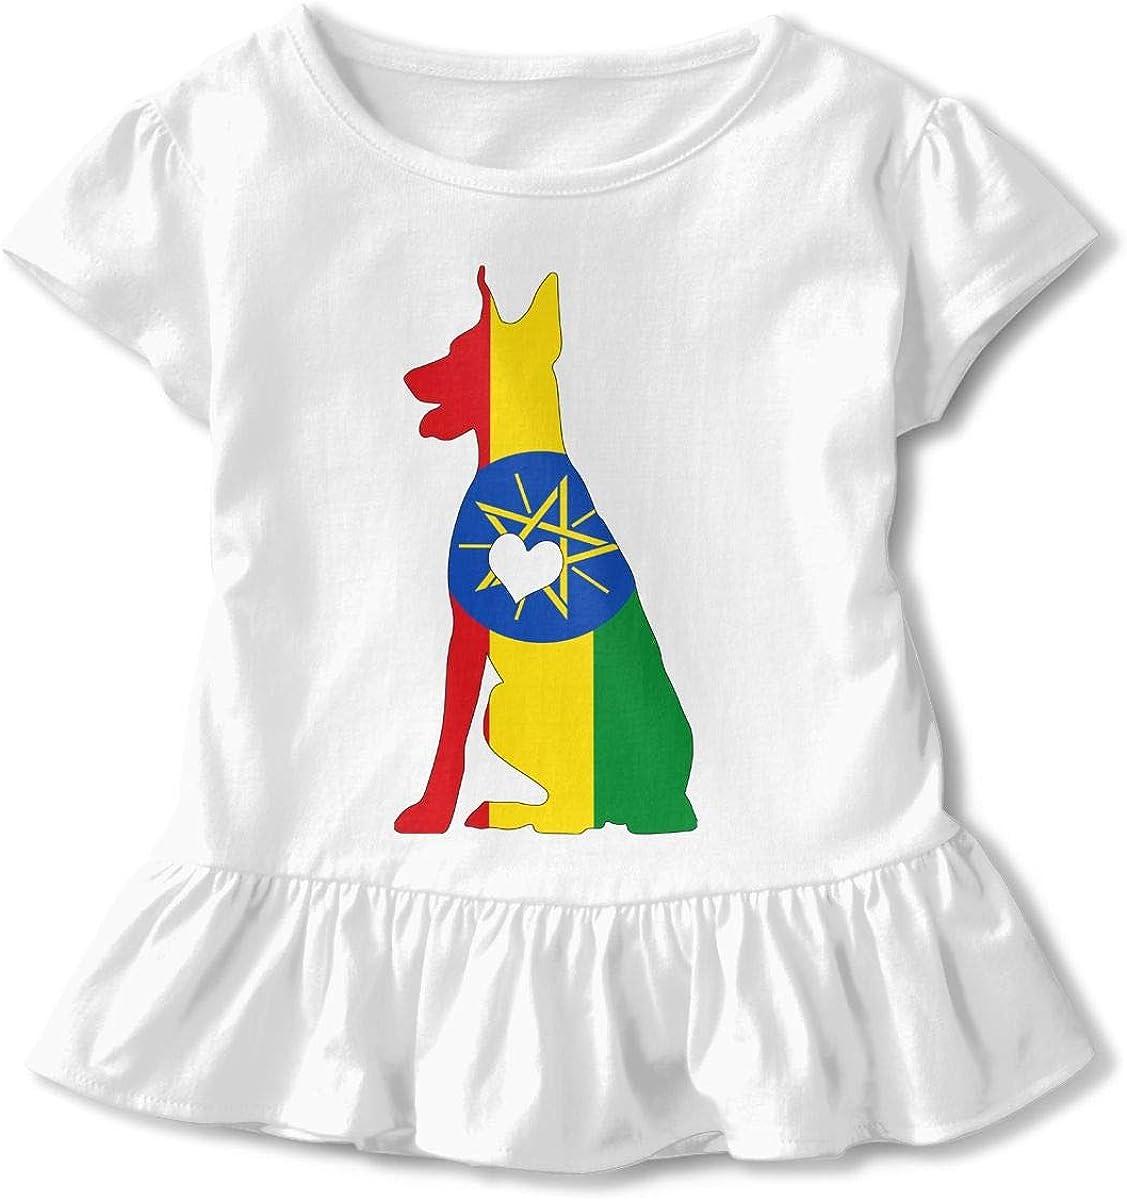 26NSHIRT Ethiopia Flag Adore Dobermans Dog Toddler Girls Short Sleeve Graphic T-Shirt